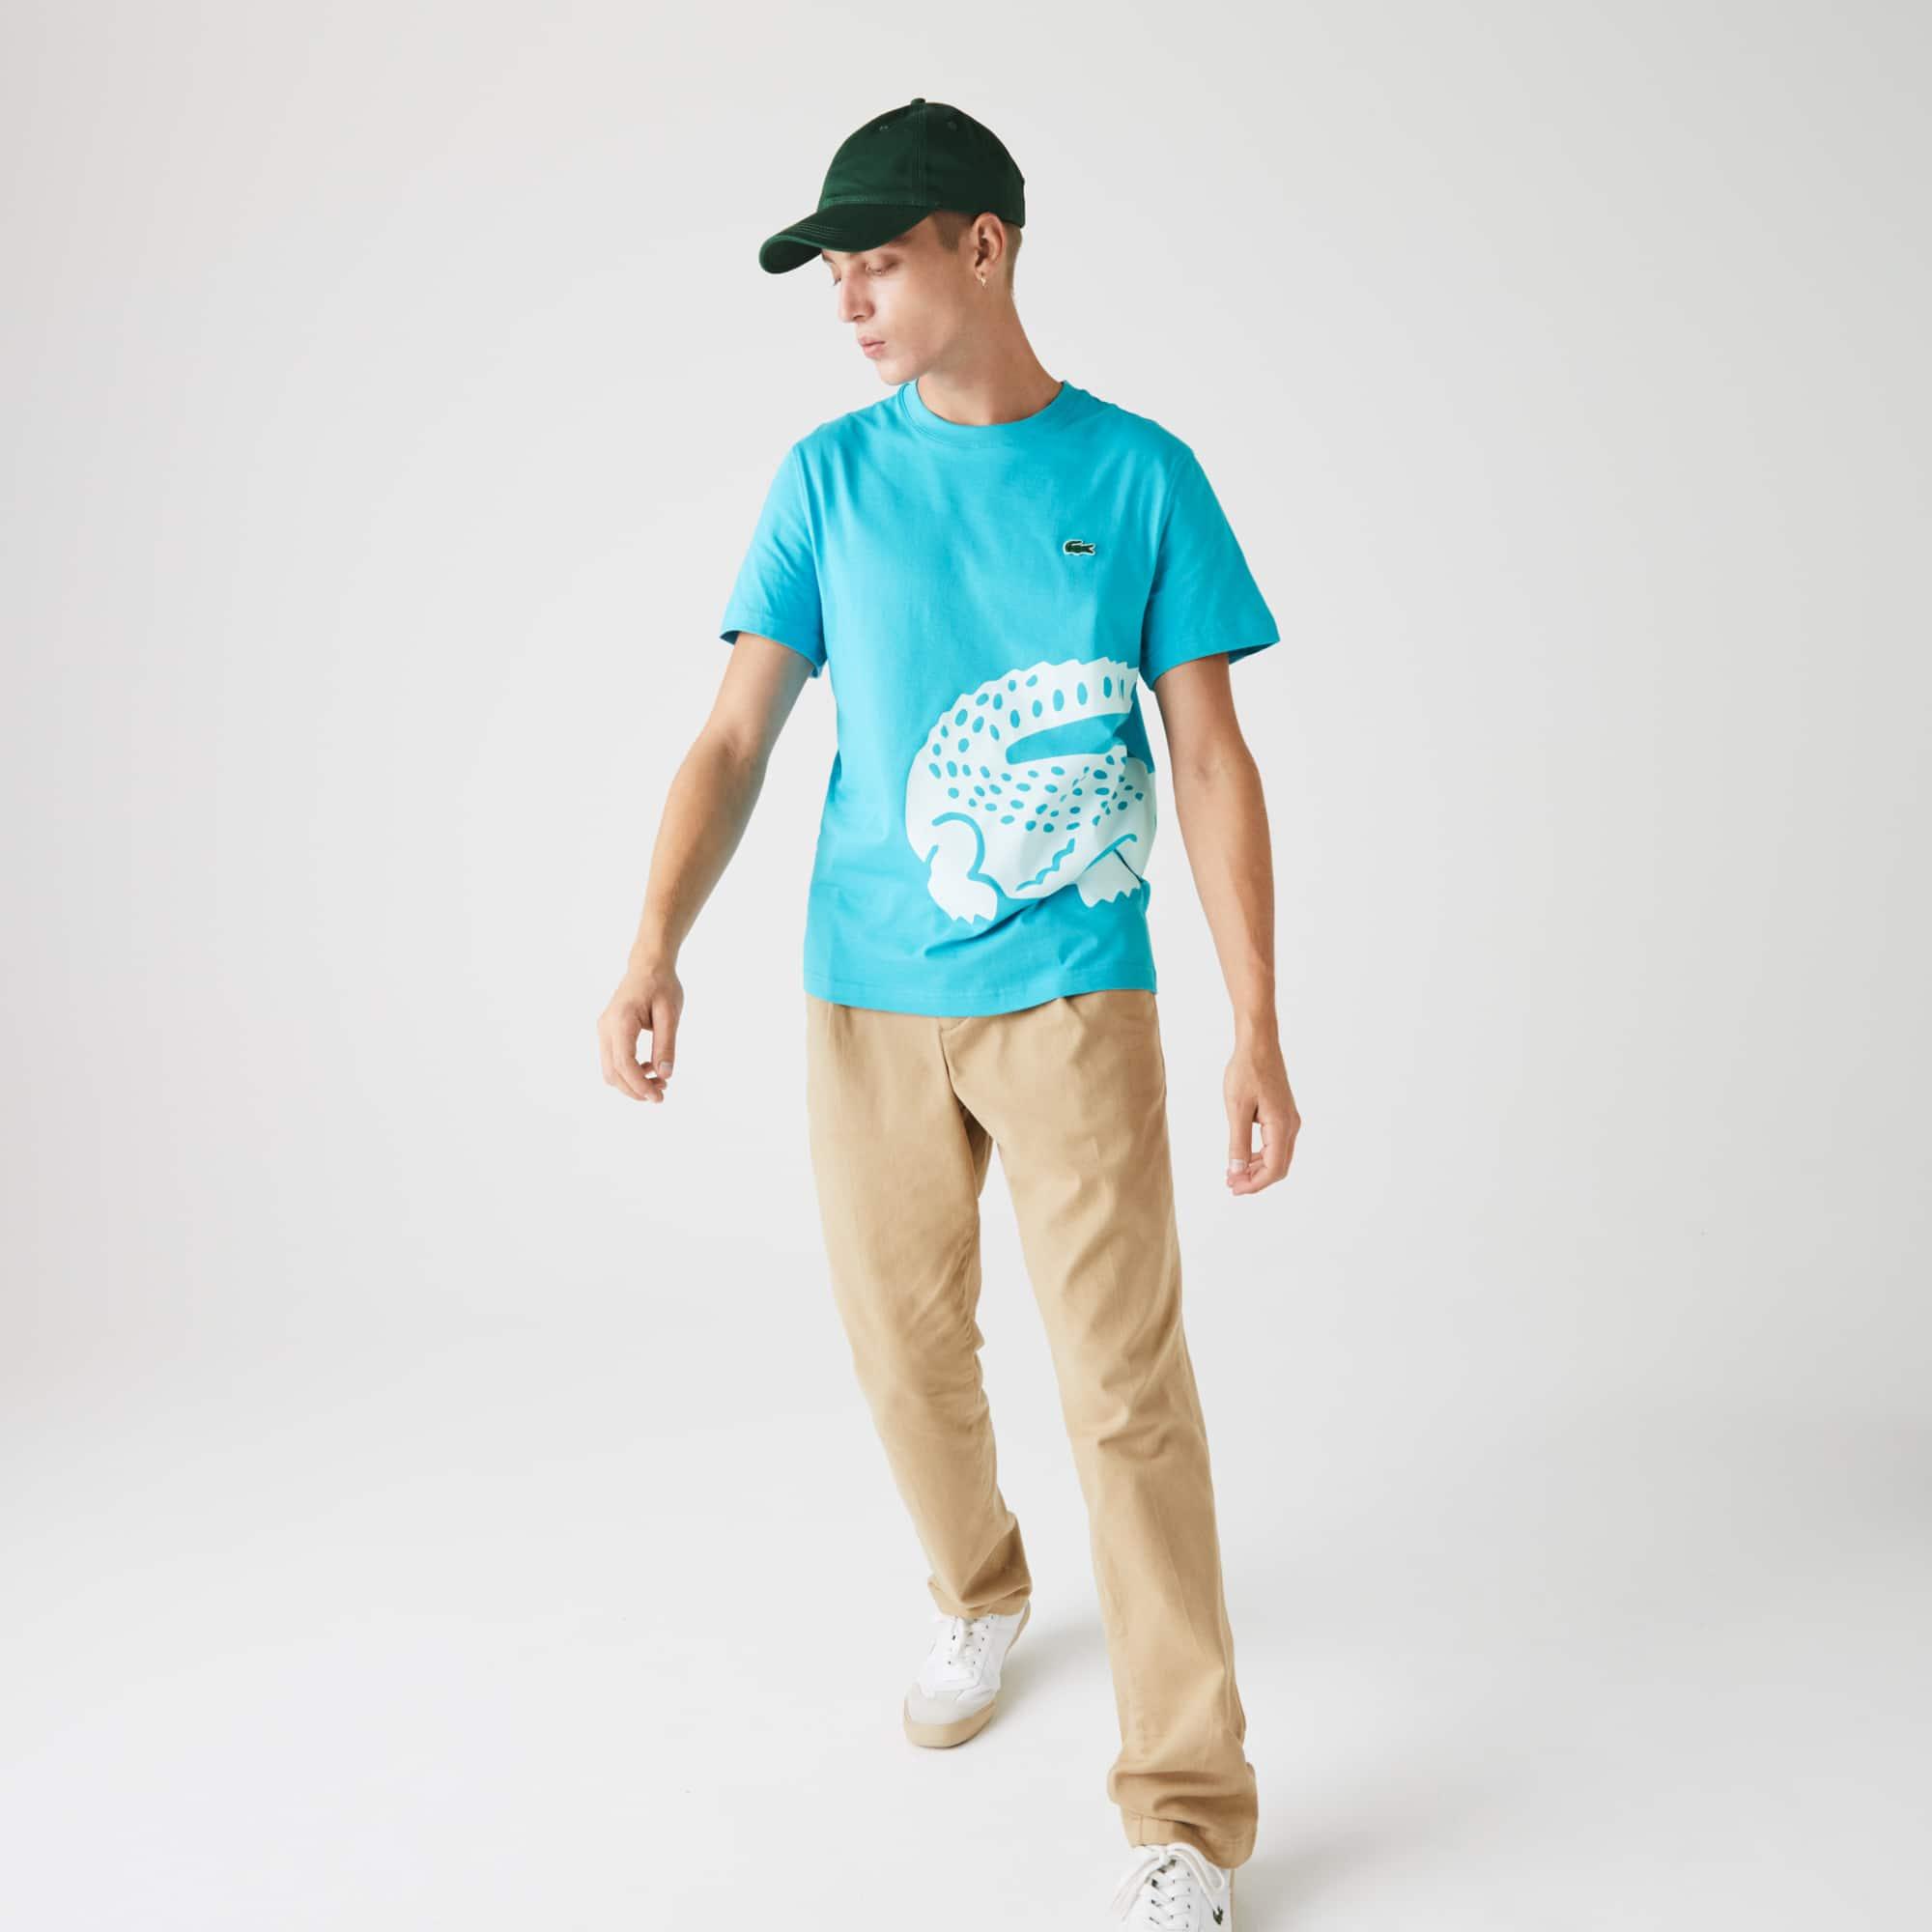 Lacoste Men's Oversize Croc Crew Neck Jersey T-shirt